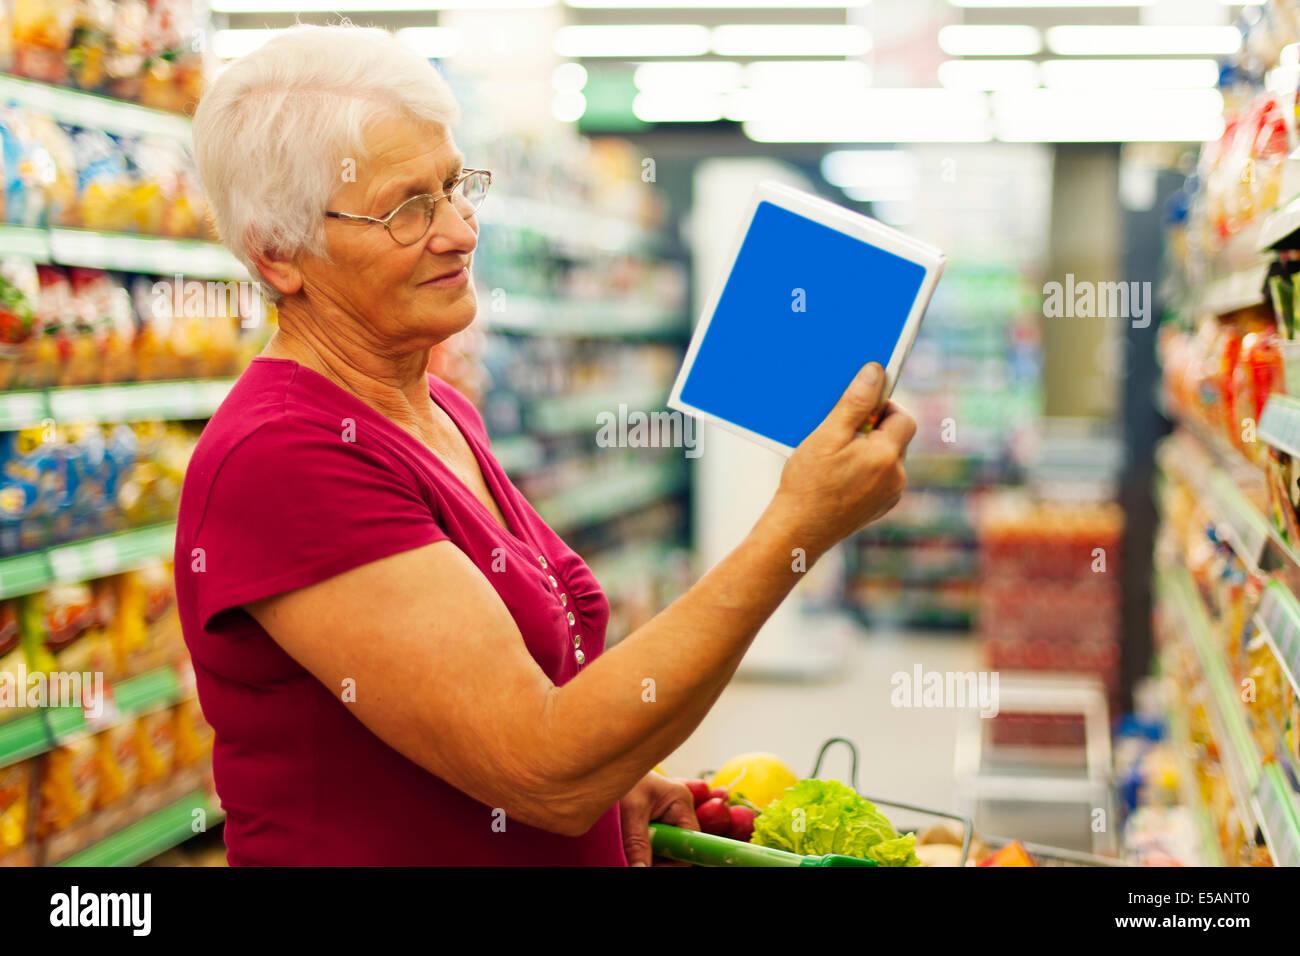 Senior woman reading description on the box, Debica, Poland - Stock Image